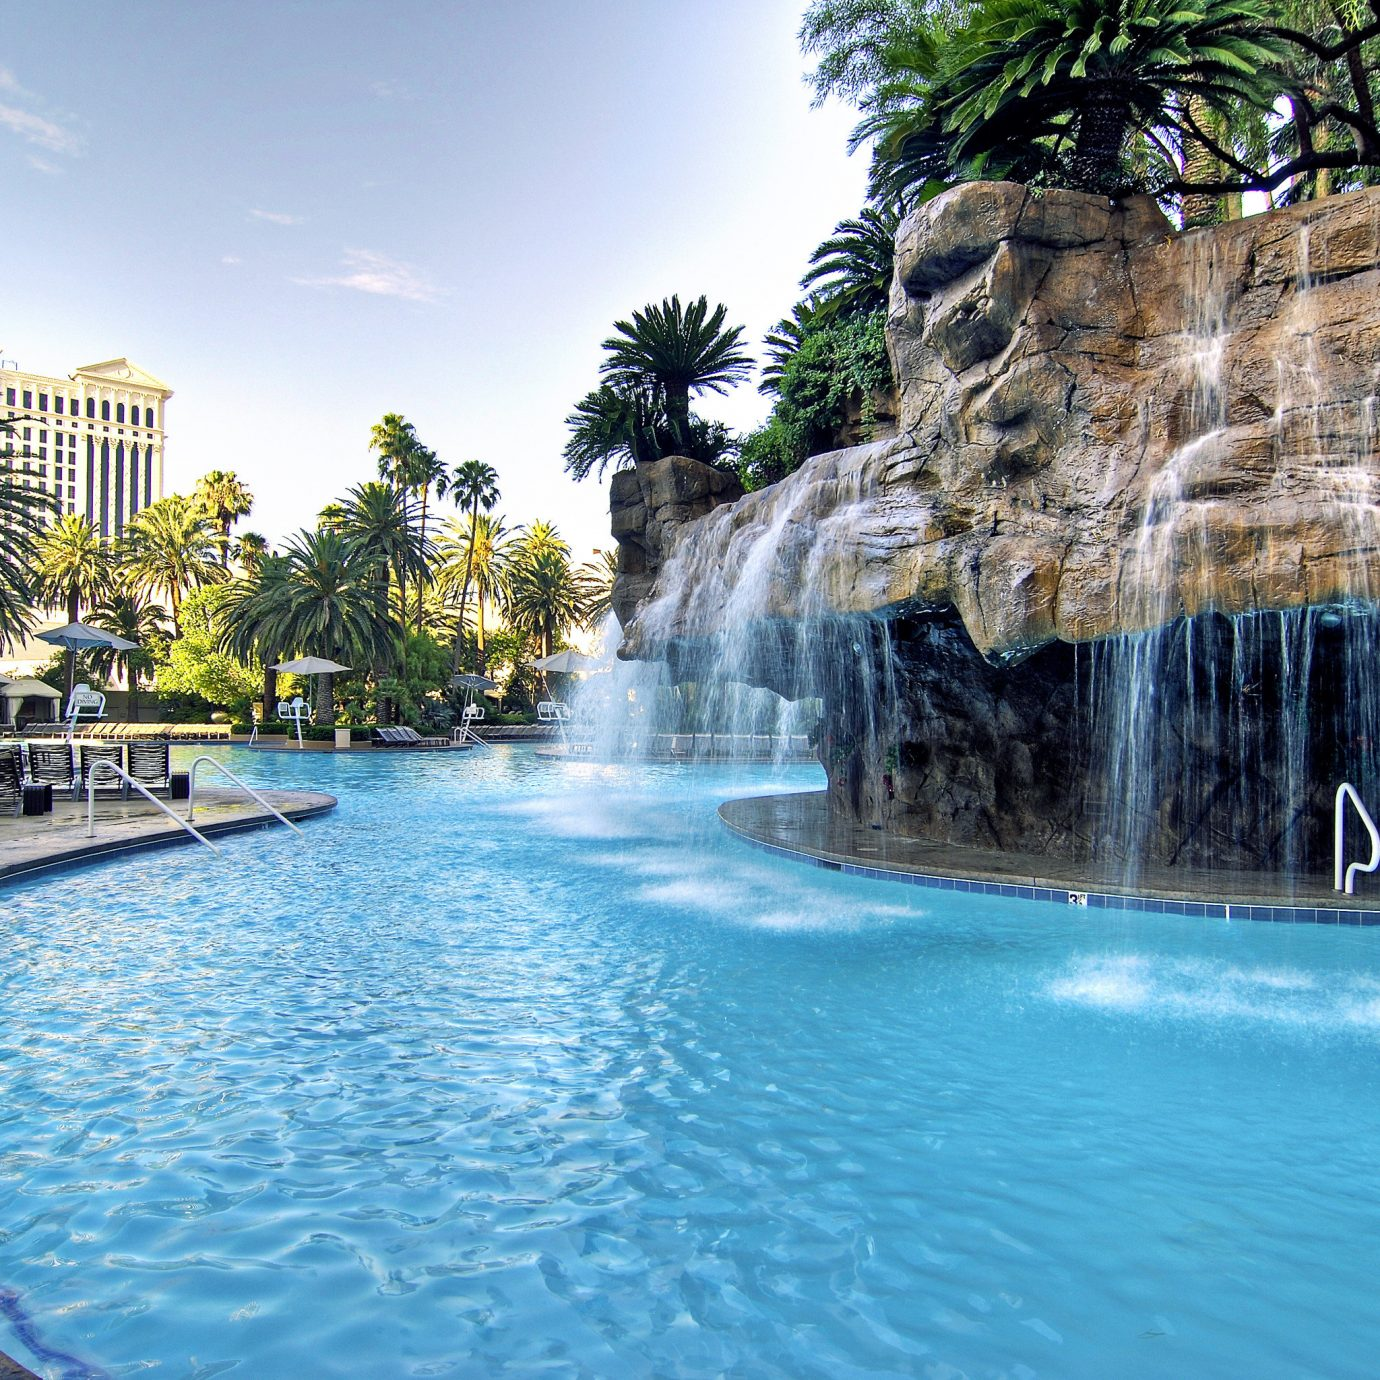 Lounge Luxury Modern Pool tree Nature water swimming pool Waterfall water feature Resort resort town surrounded